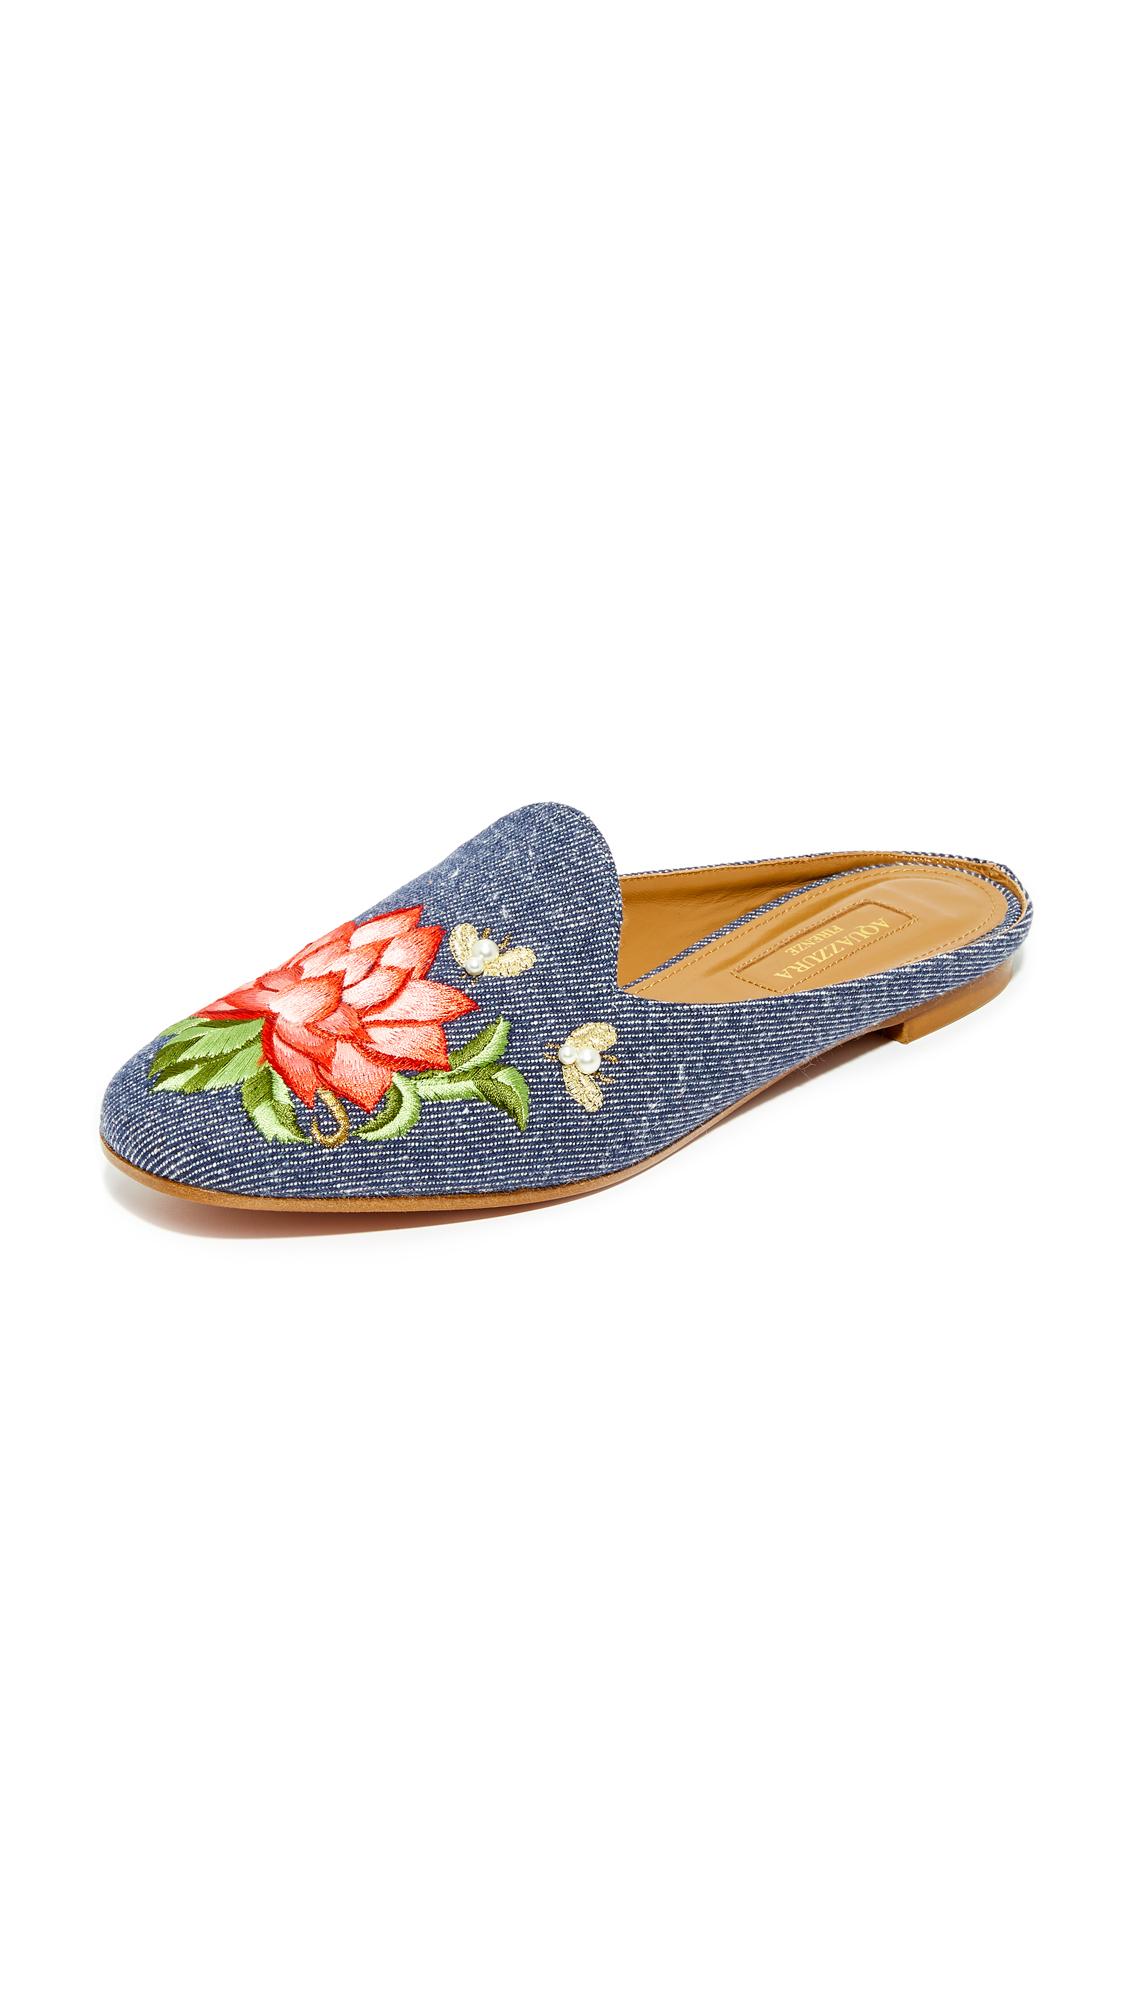 Aquazzura Lotus Slippers - Jeans Blue